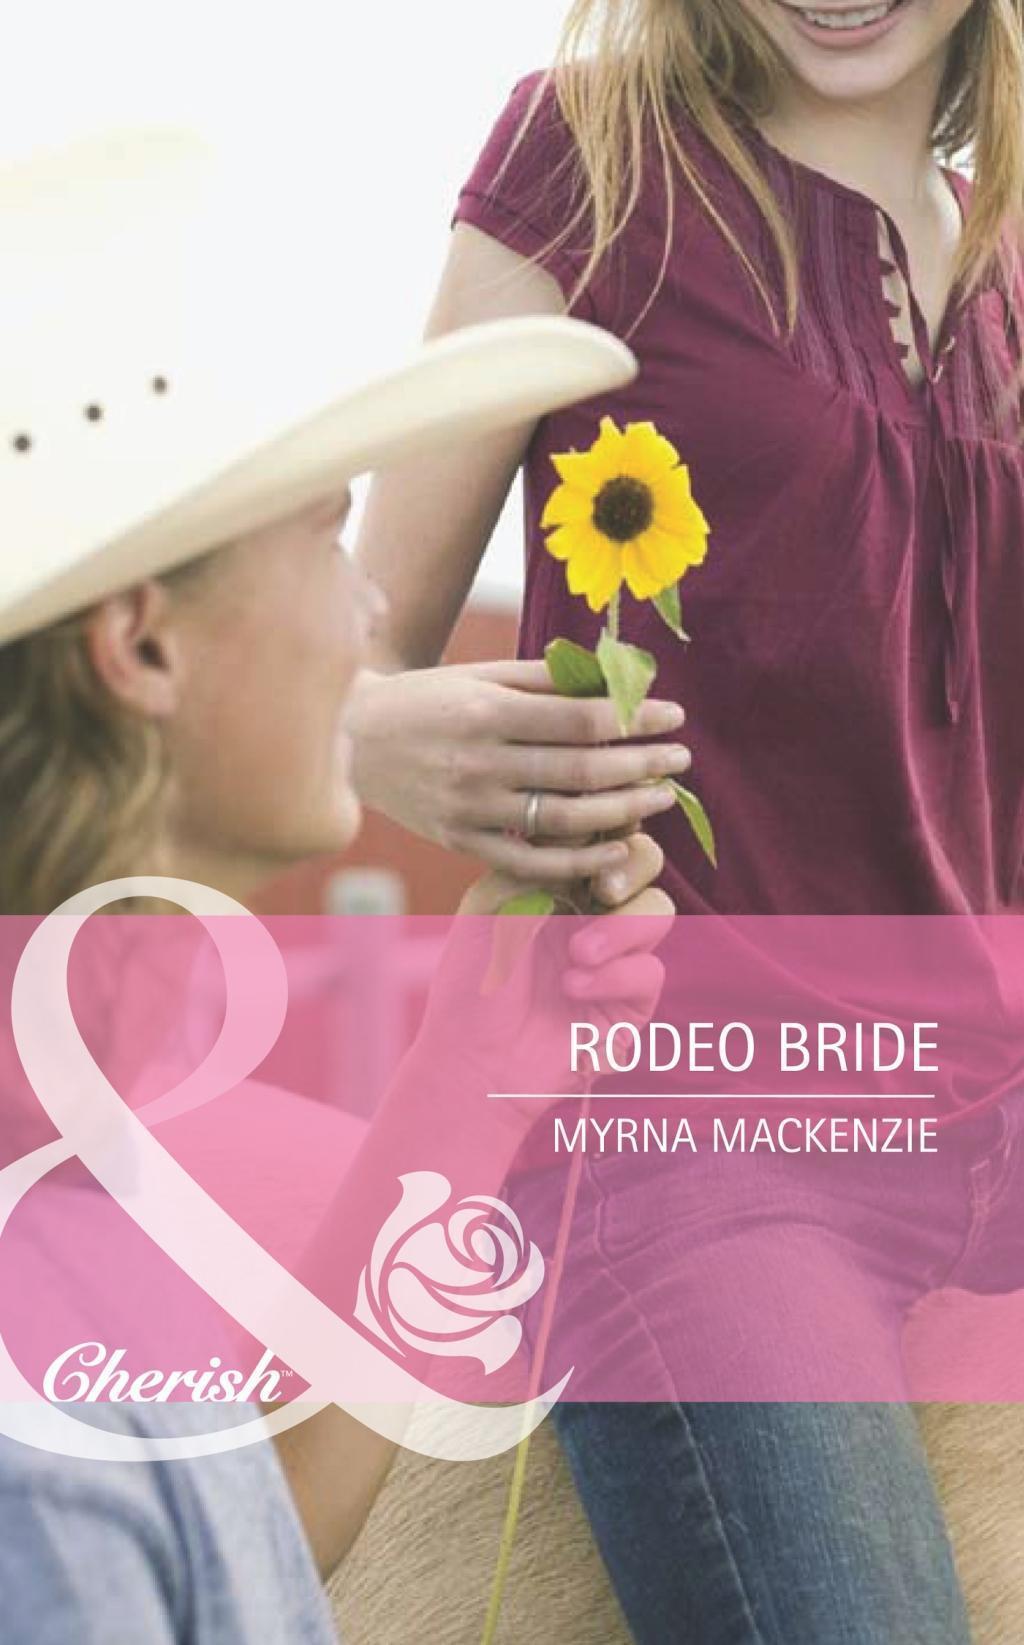 Rodeo Bride (Mills & Boon Romance)